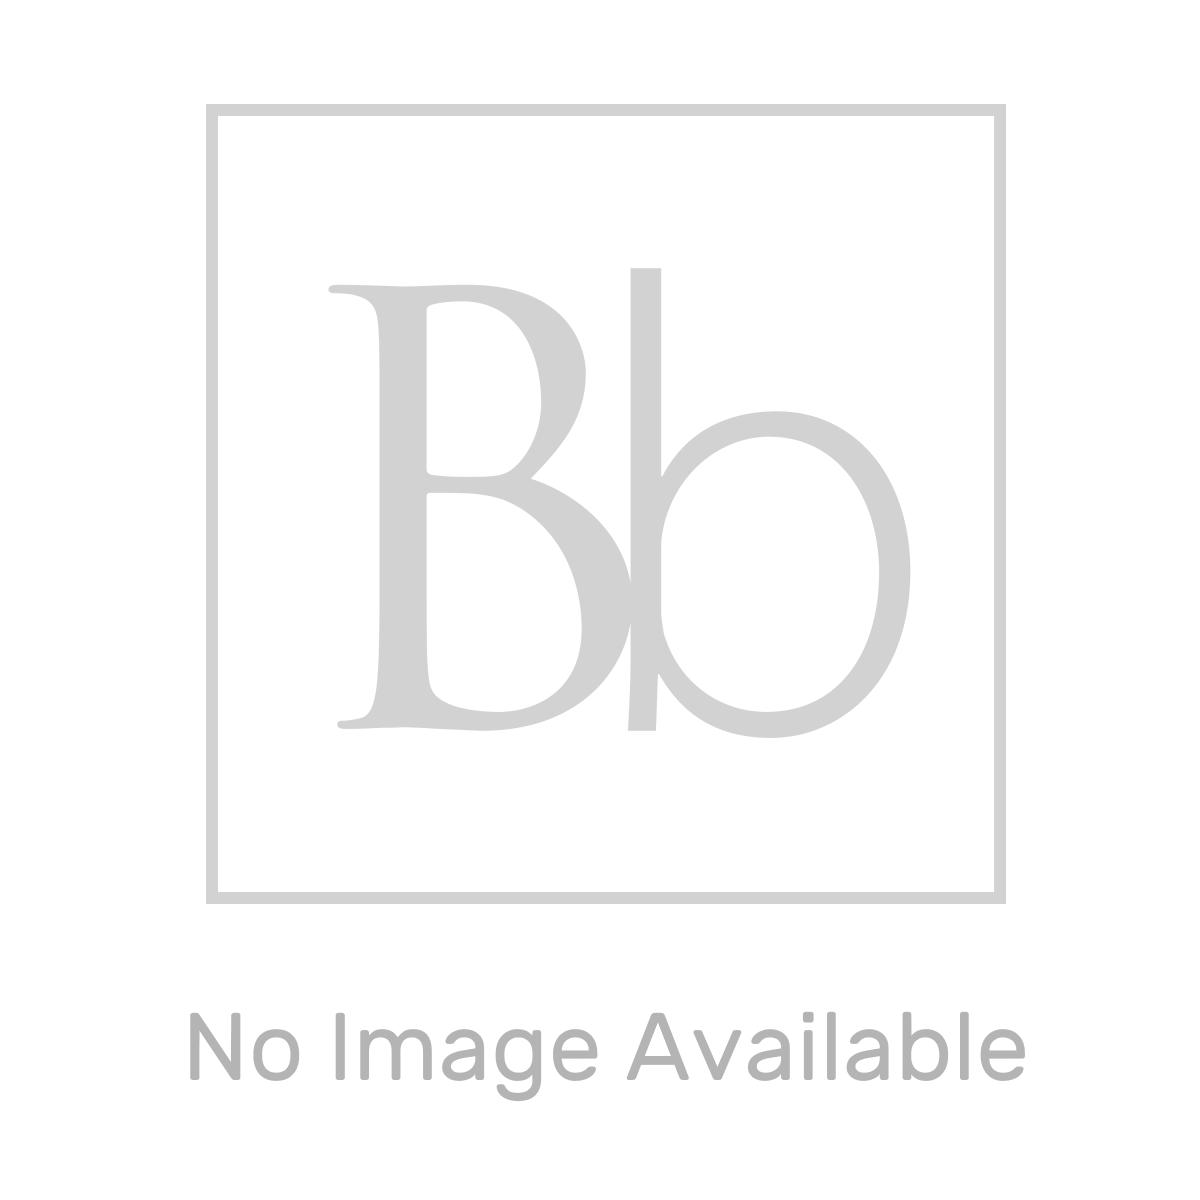 Merlyn Black Sliding Shower Door with Optional Side Panel